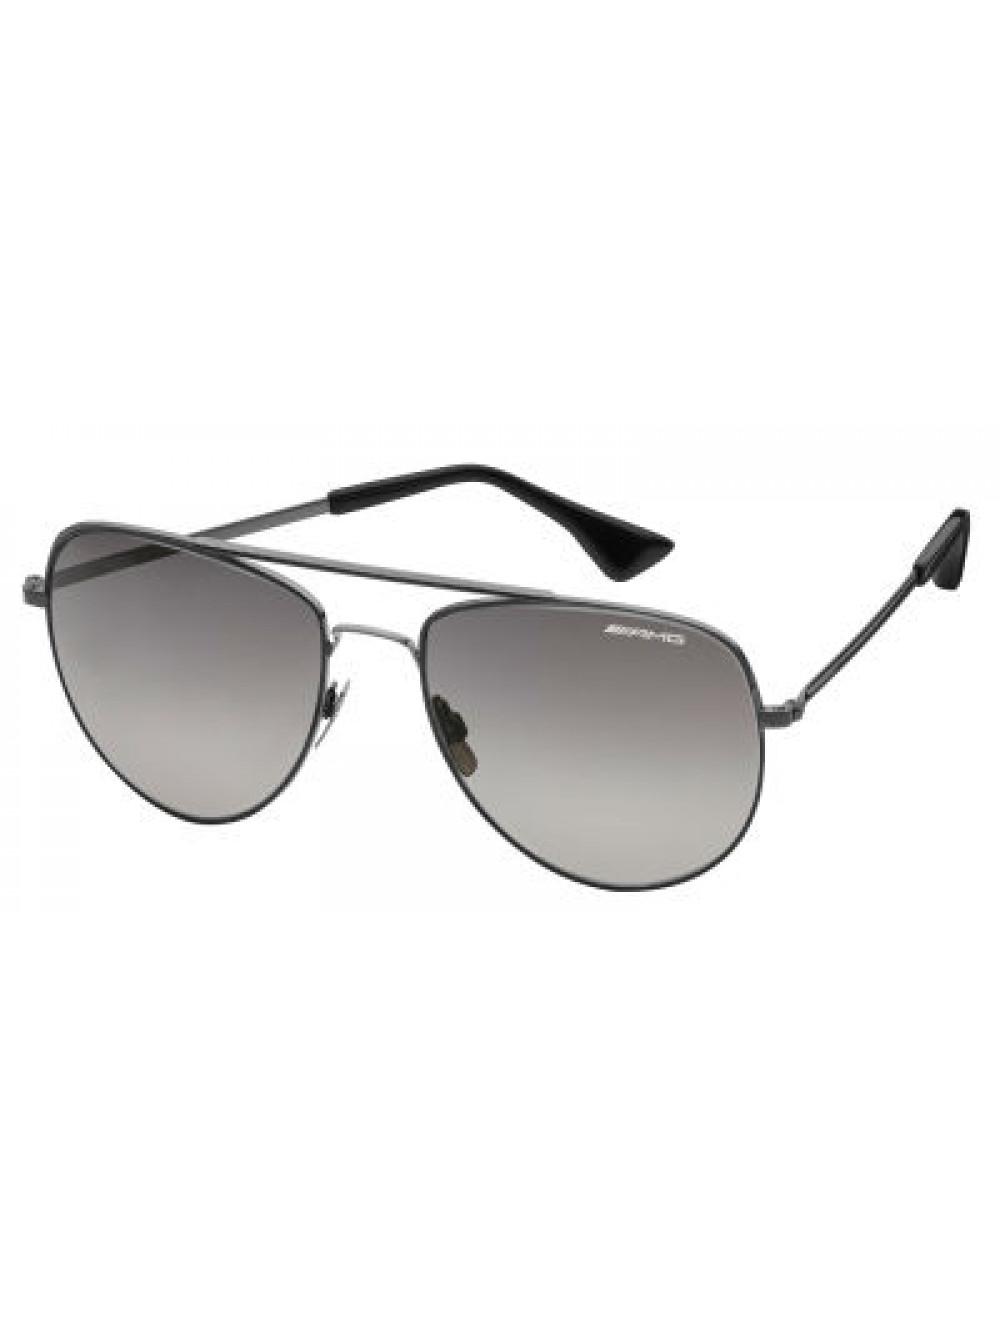 Солнцезащитные очки Mercedes-AMG Sunglasses, Essentials, Gunmetal